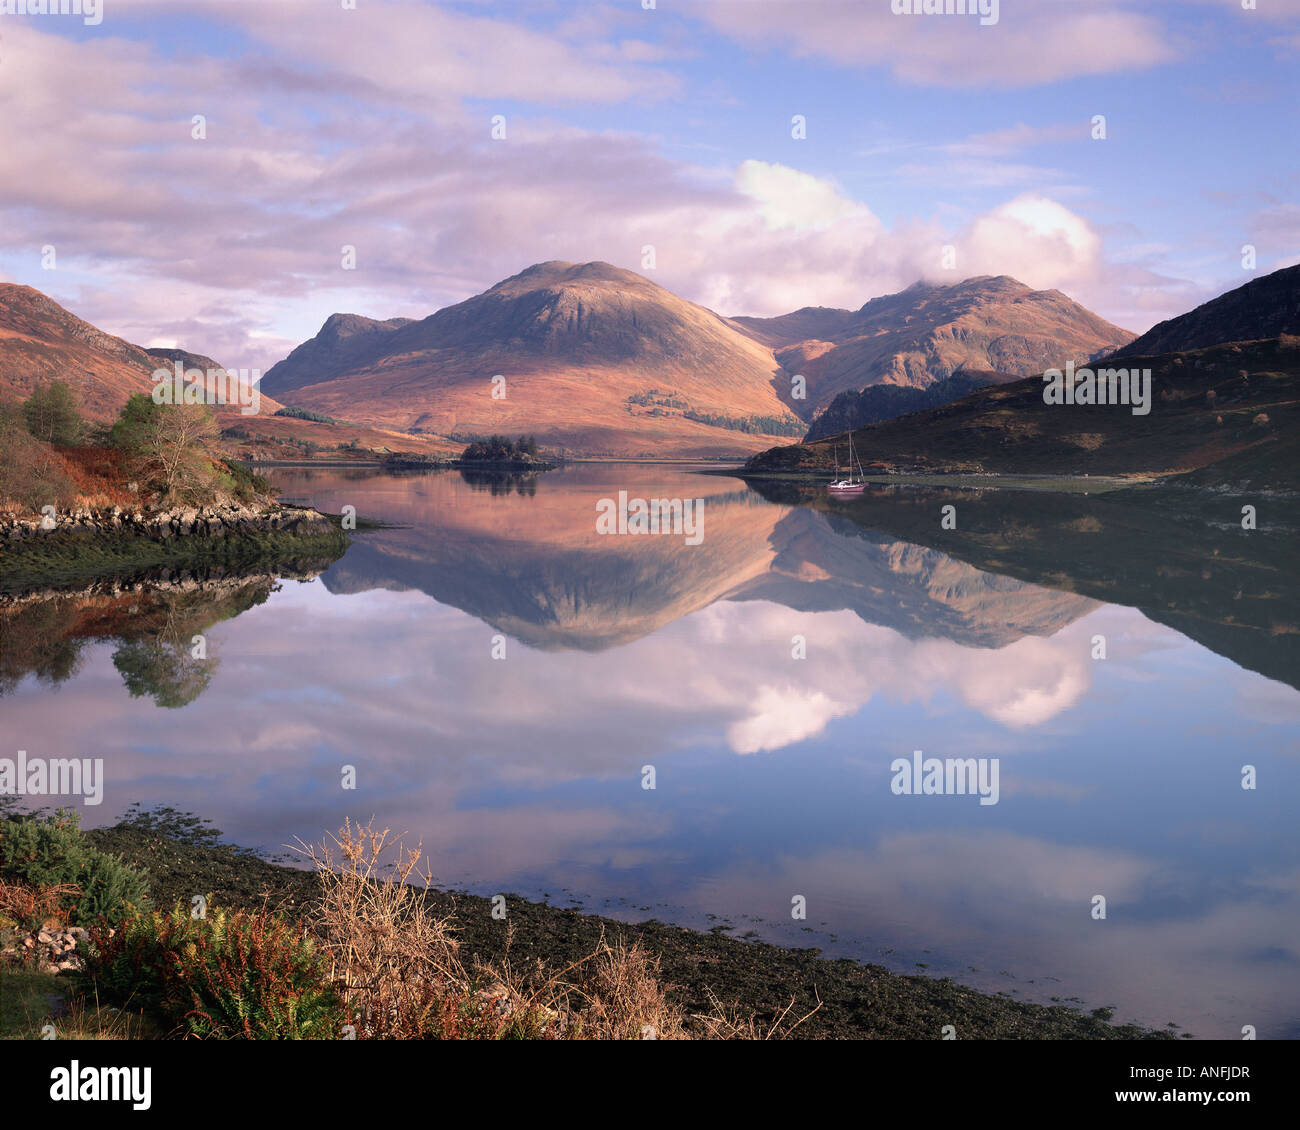 GB - Schottland: Abend am Loch lang Stockbild